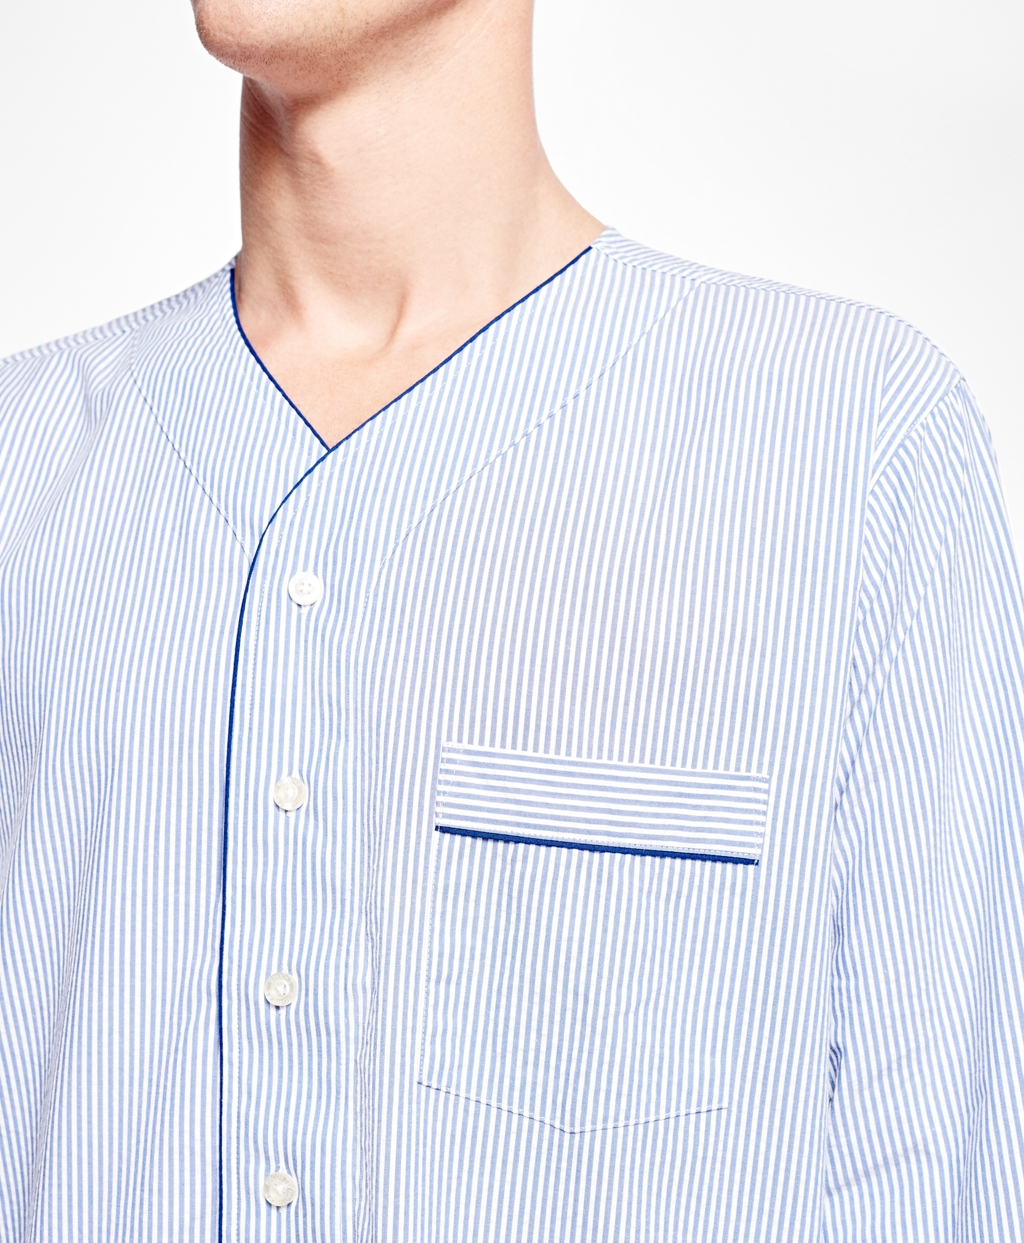 Lyst - Brooks Brothers Seersucker Candy Stripe Nightshirt in Blue ... f2ec80be0